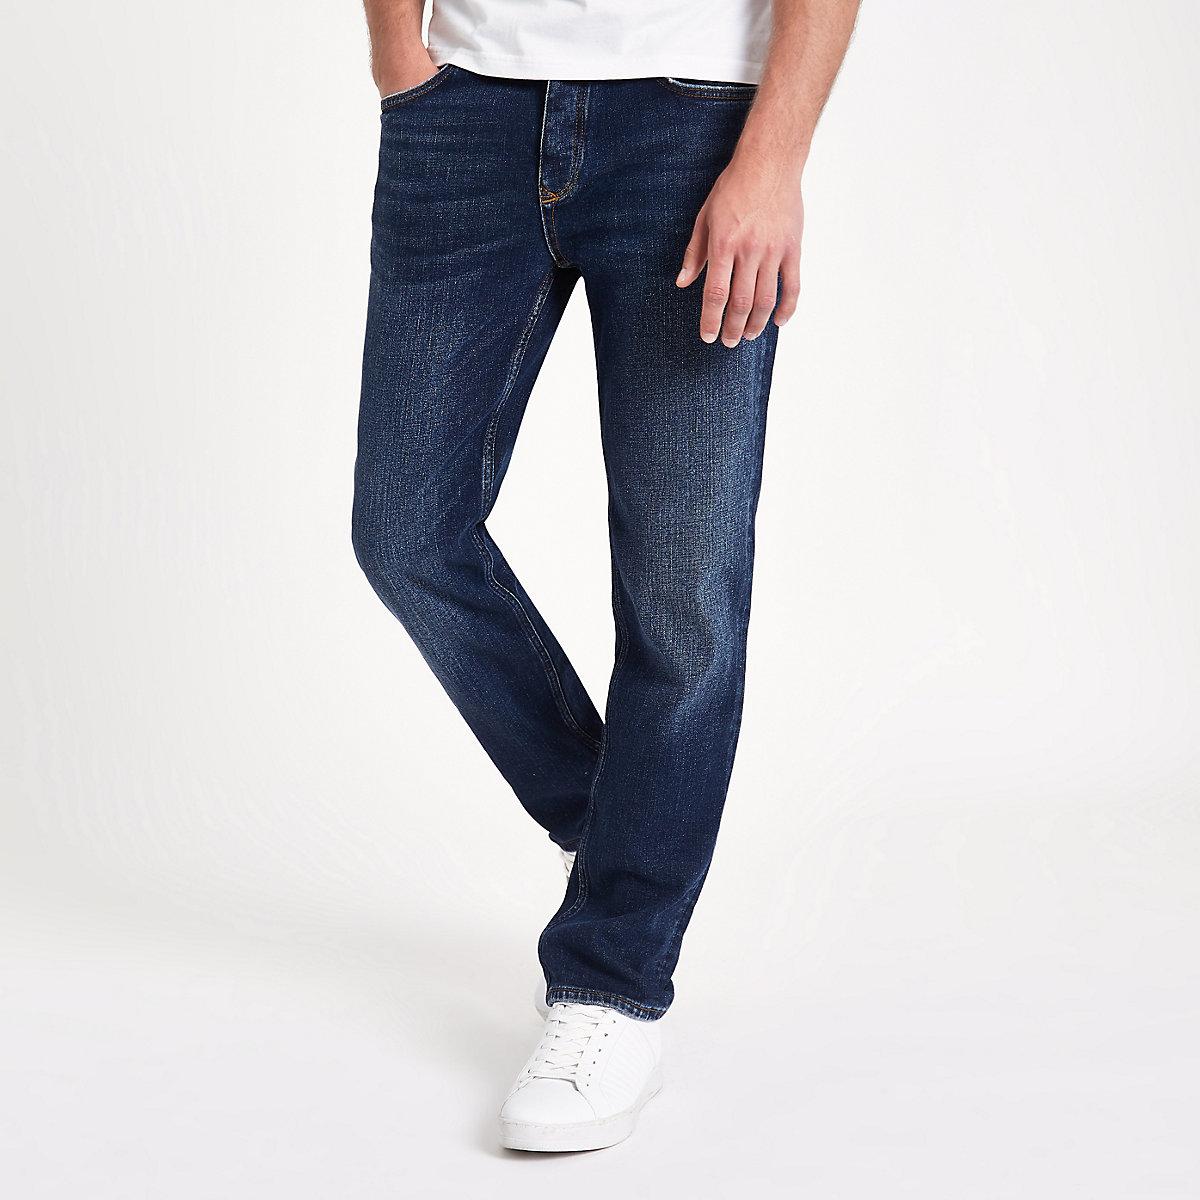 Blue Bobby standard jeans